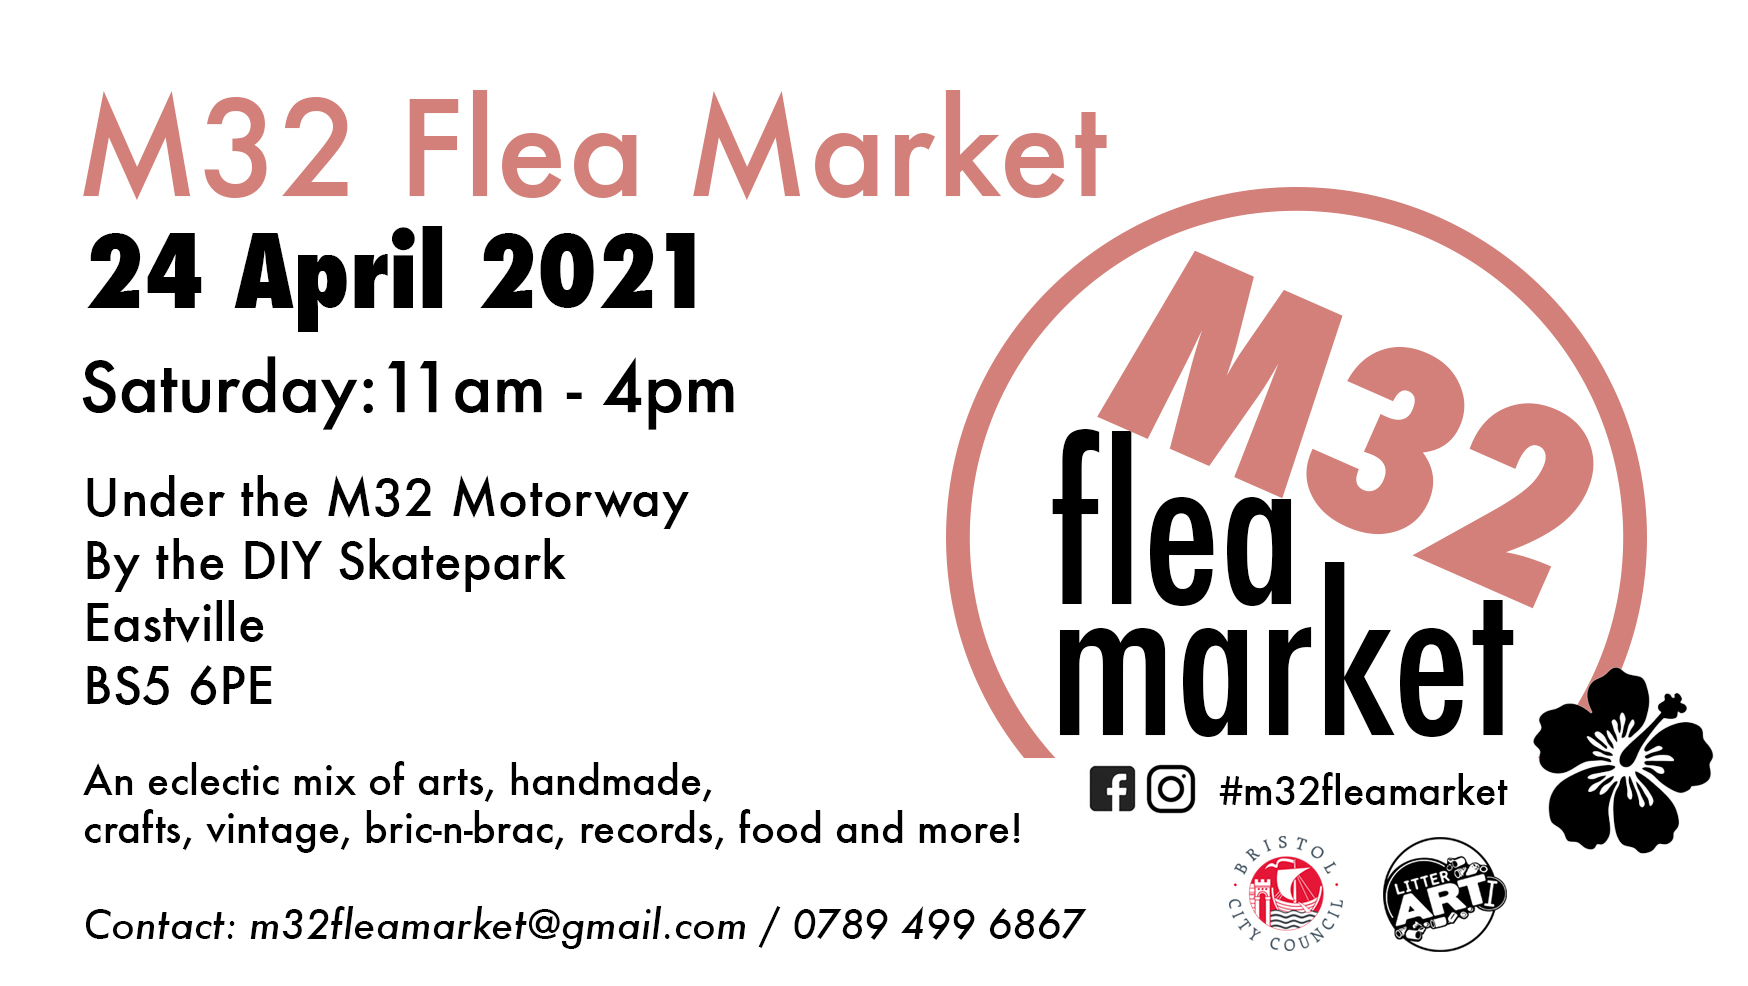 M32 Flea Market 24 April 2021 Tickets | M32 Underpass ...